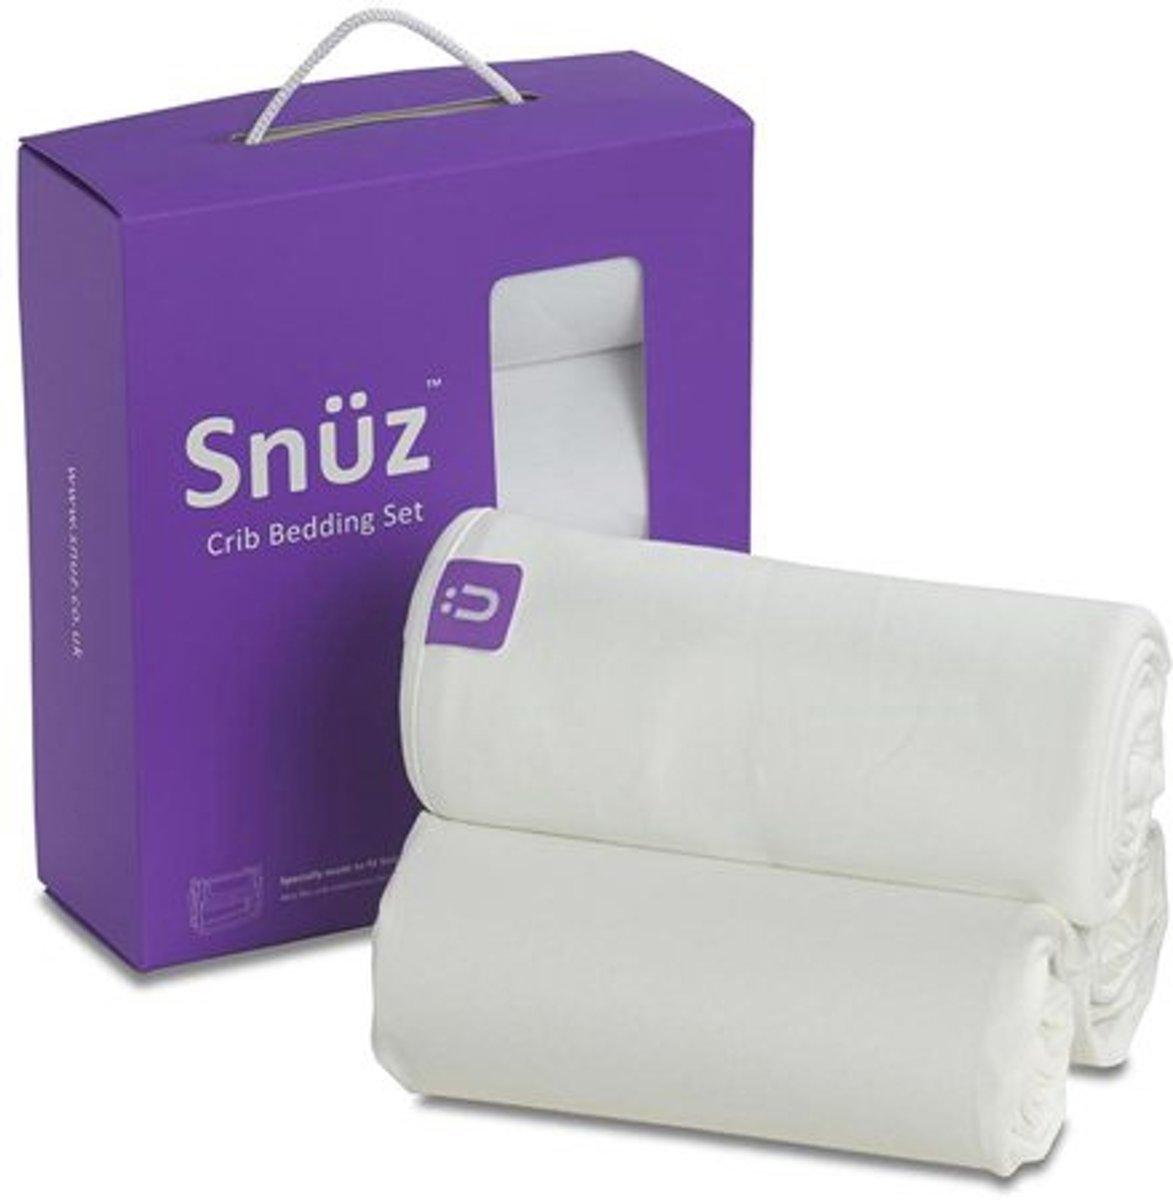 SnuzPod Bedding Set wit